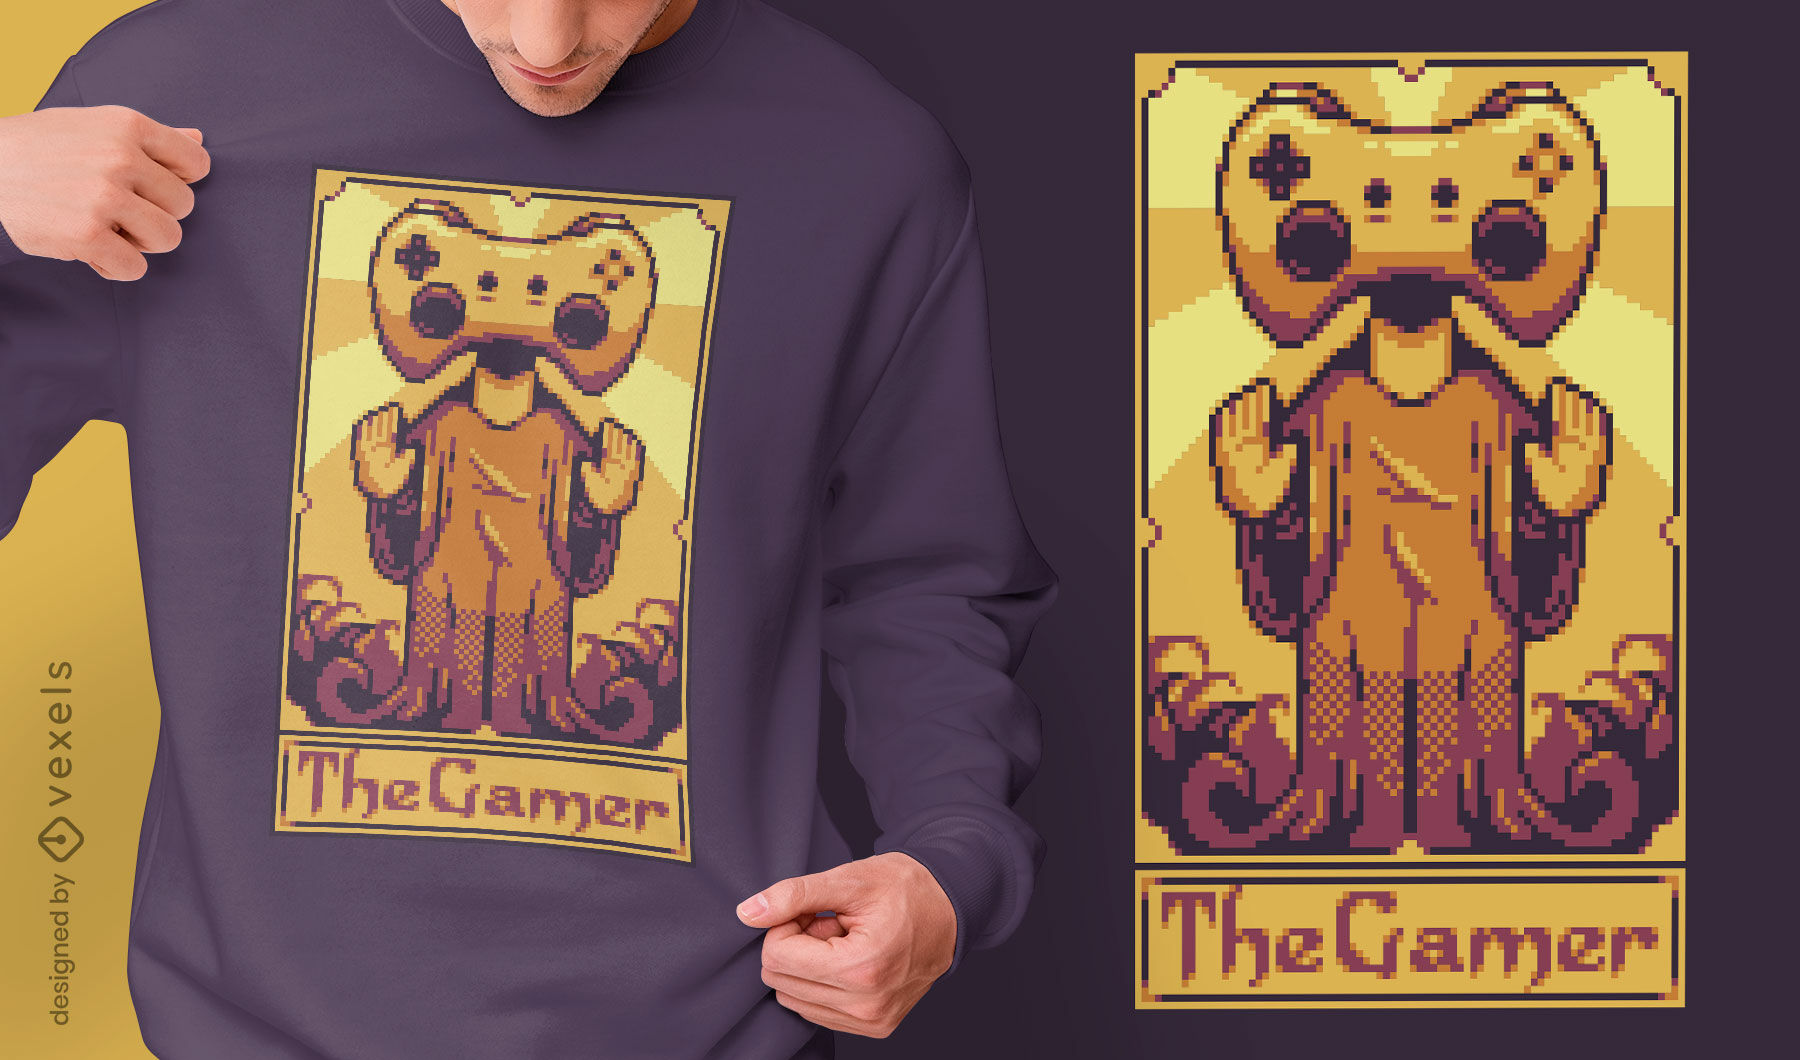 Diseño de camiseta de jugador de joystick de tarjeta de tarot de píxeles